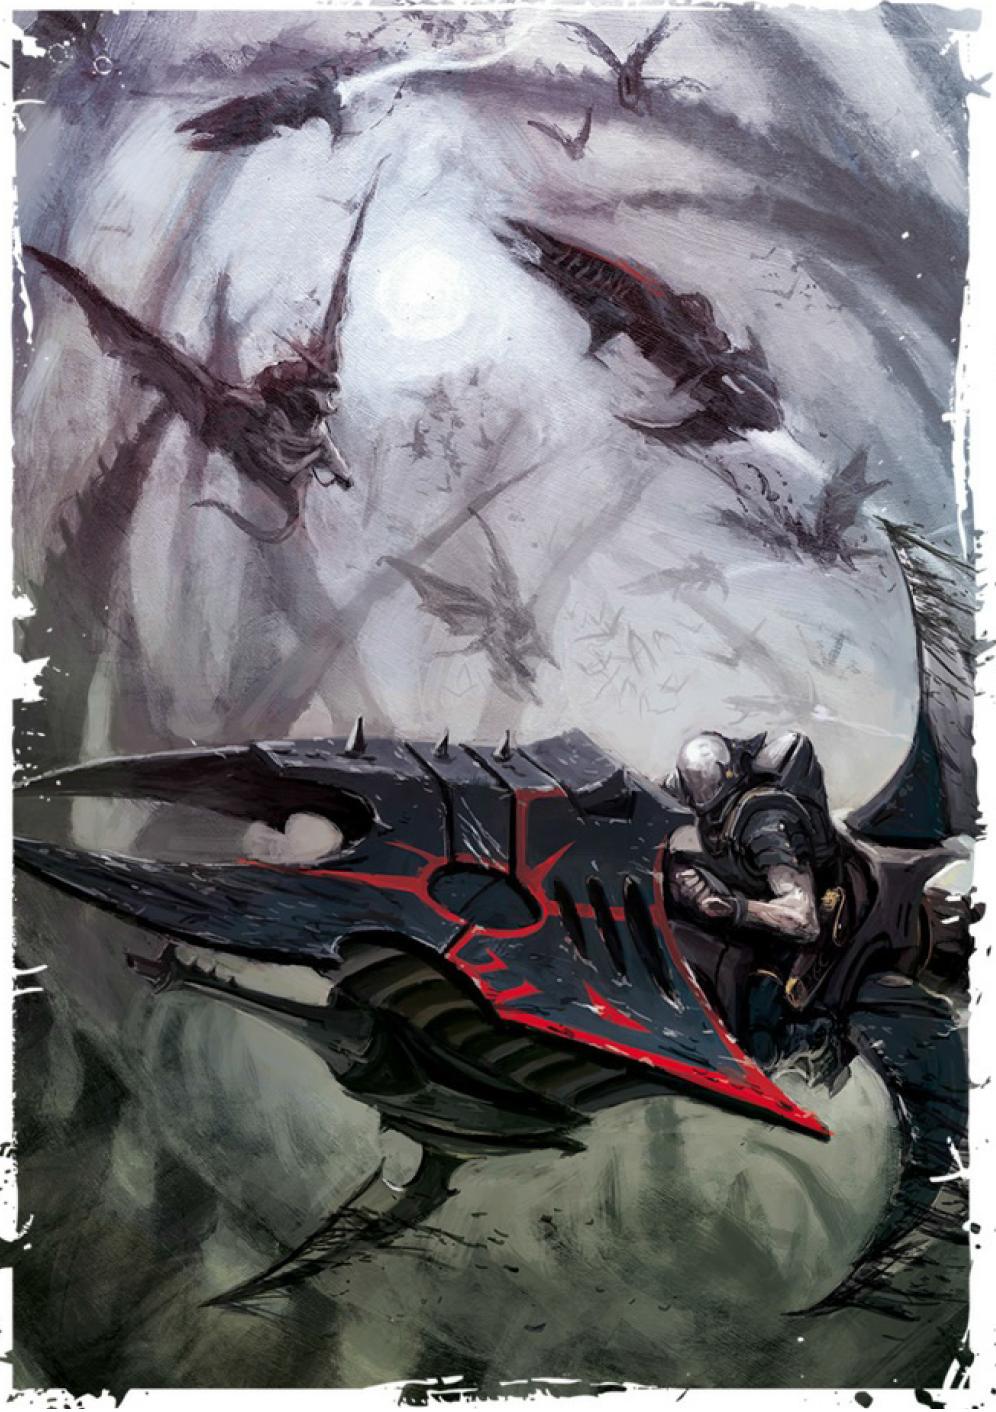 Warhammer 40k Dark Eldar Aeldari Drukhari Bits:Reaver Jet Bike Splinter Rifles 3